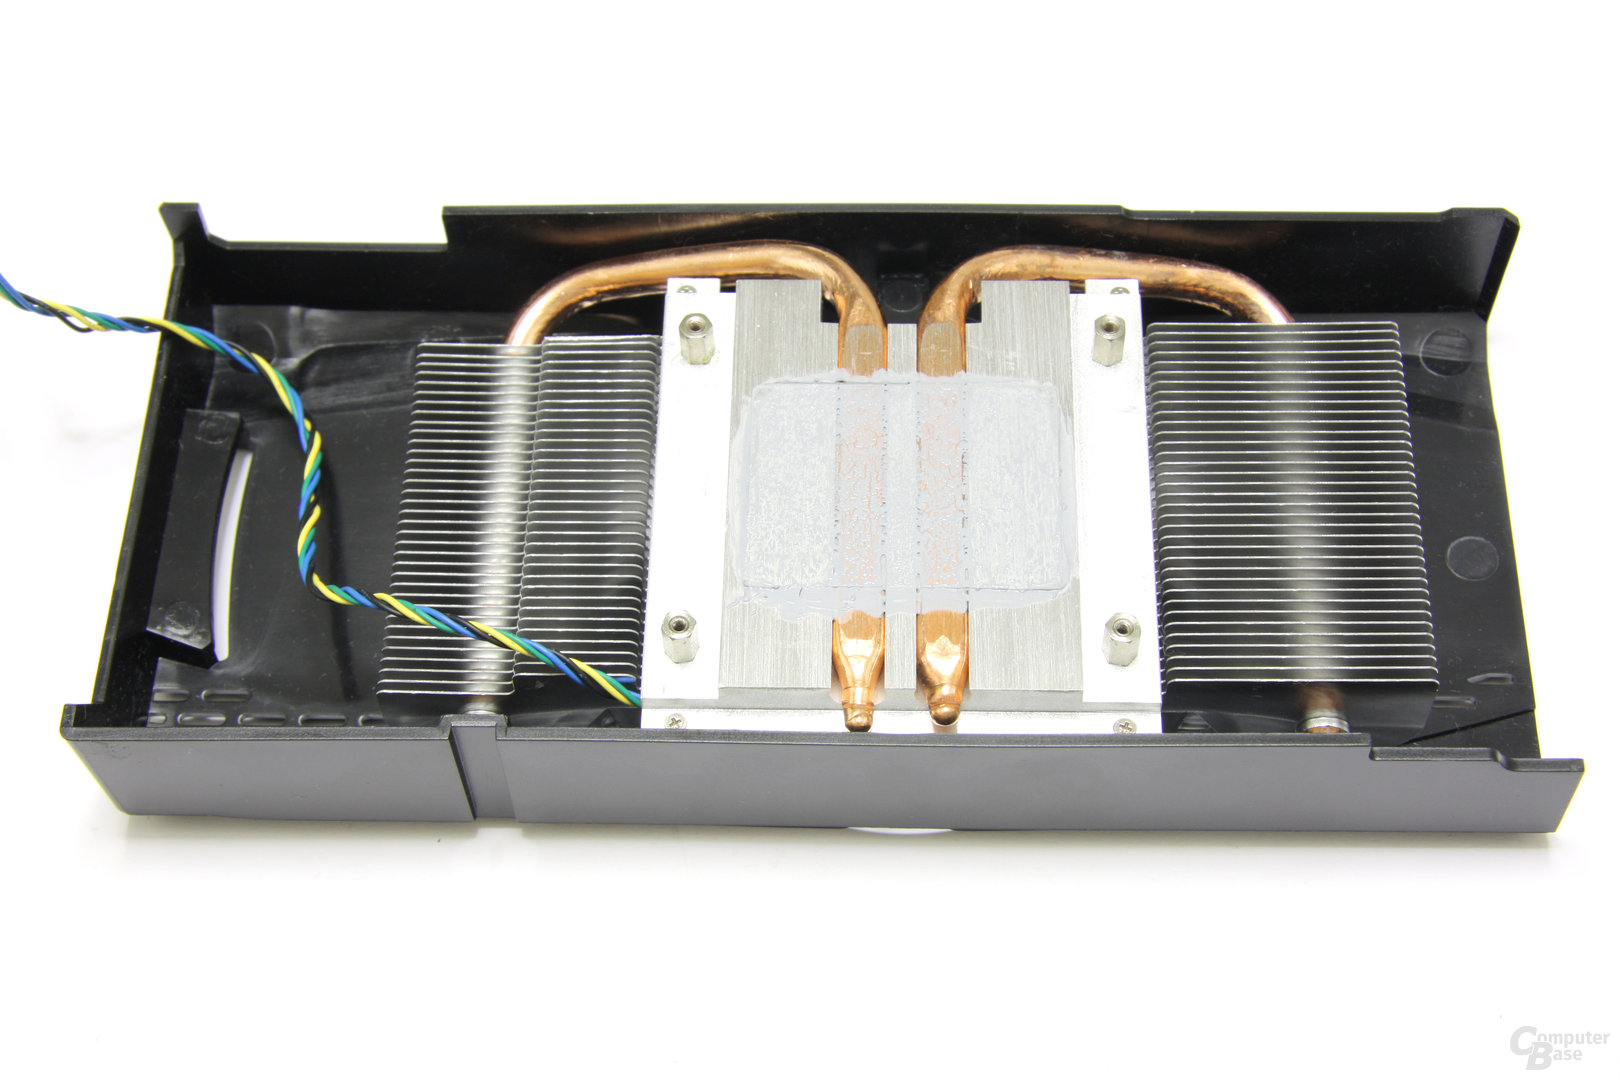 GeForce GTX 460 OC Kühlerrückseite